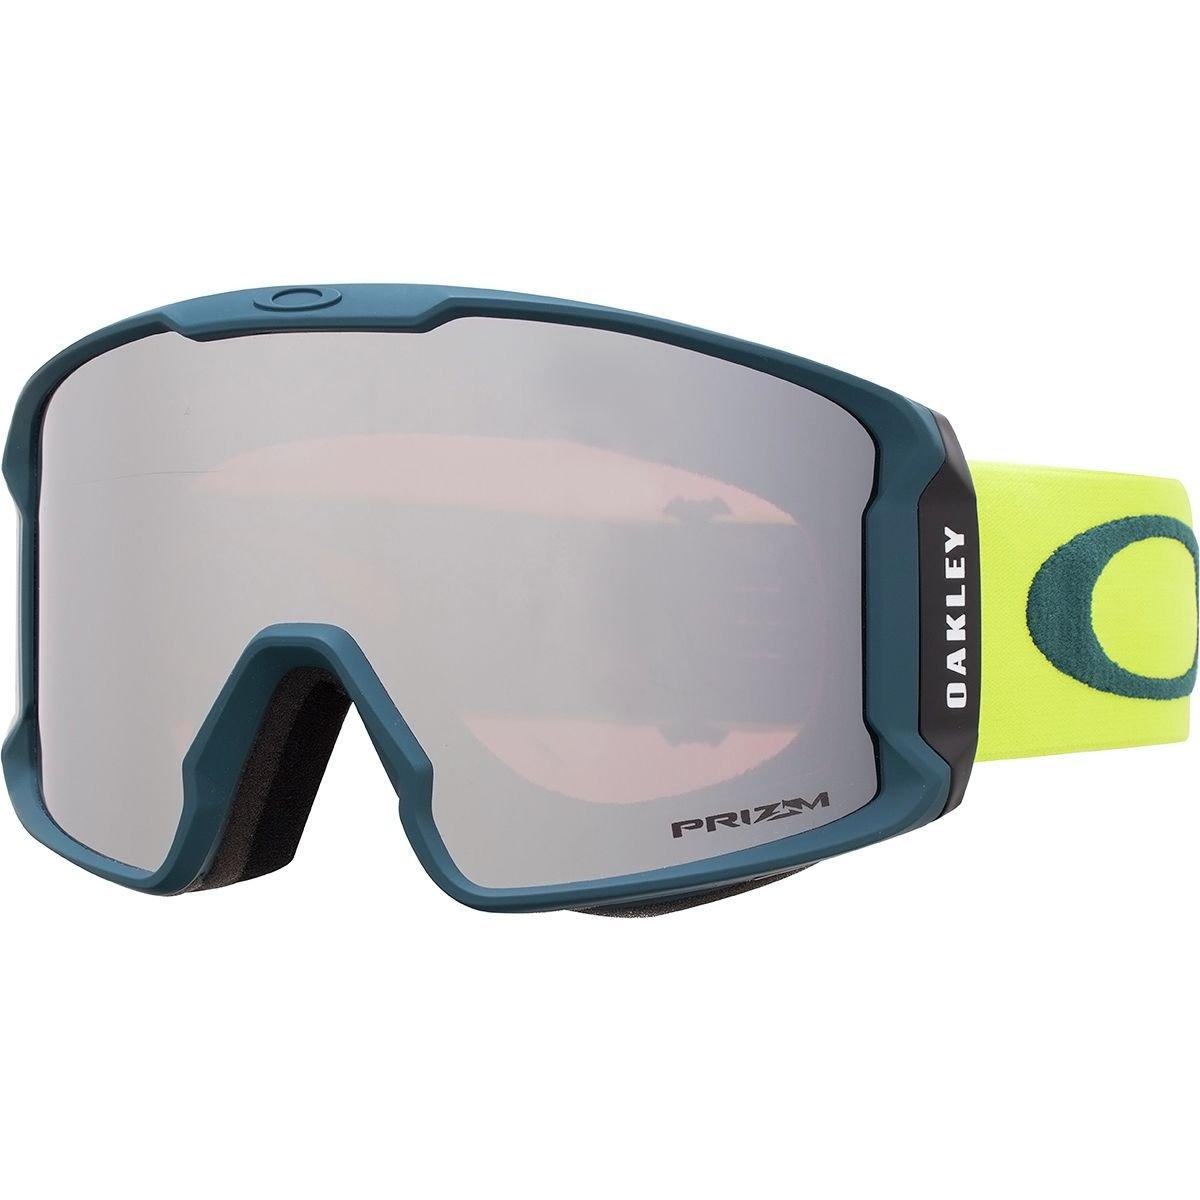 2019 Oakley Line Miner Snow Goggle